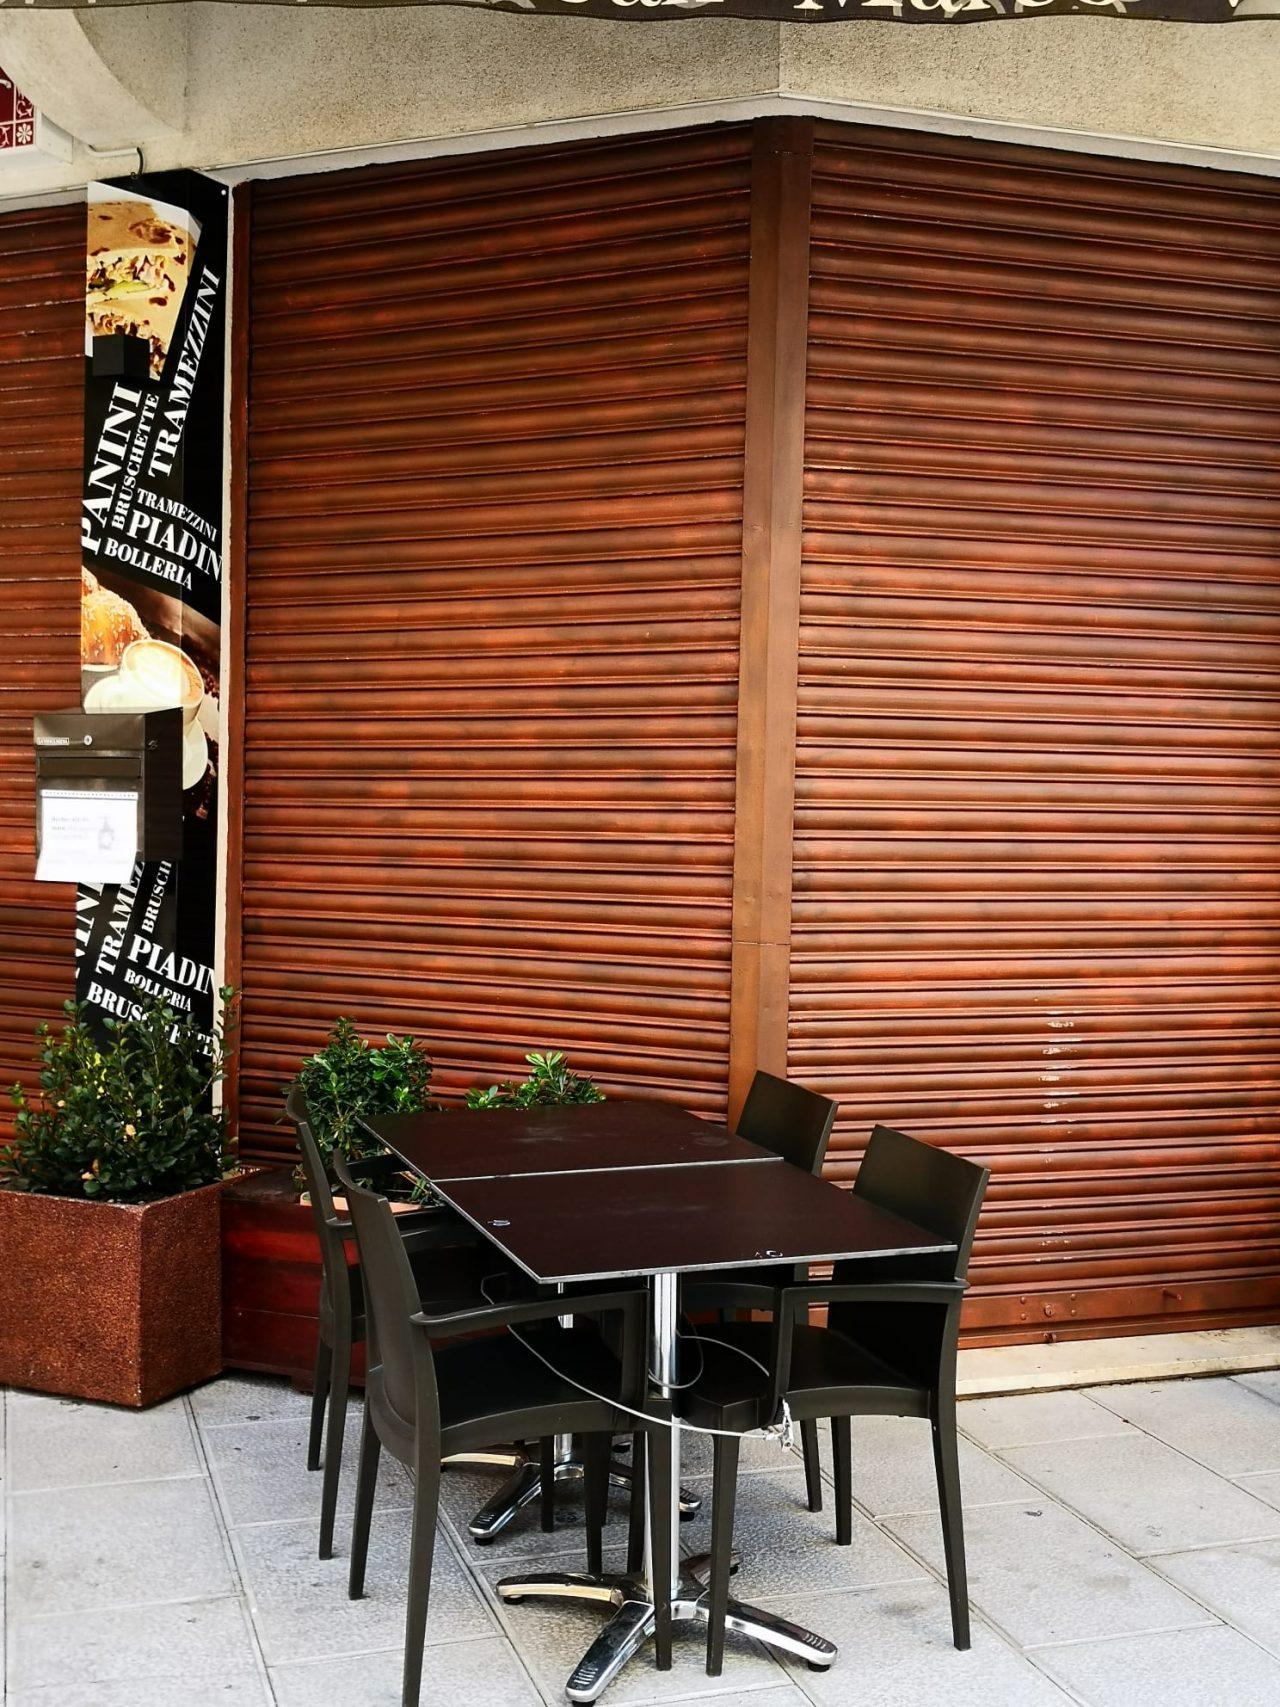 restaurants5-1280x1707.jpg